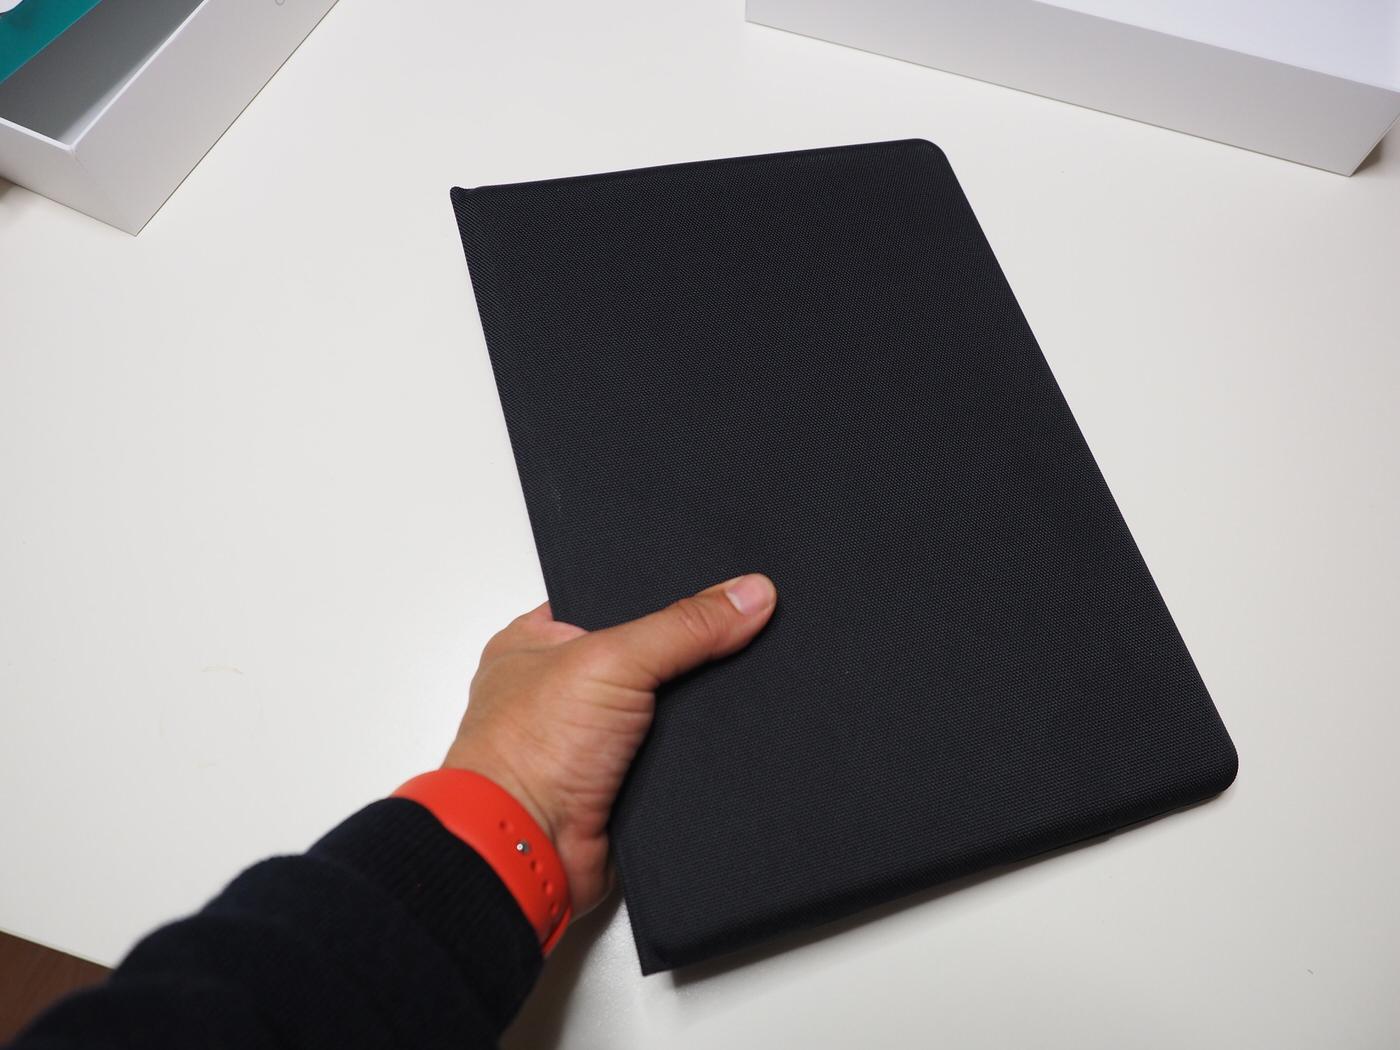 Logitech Create per iPad Pro